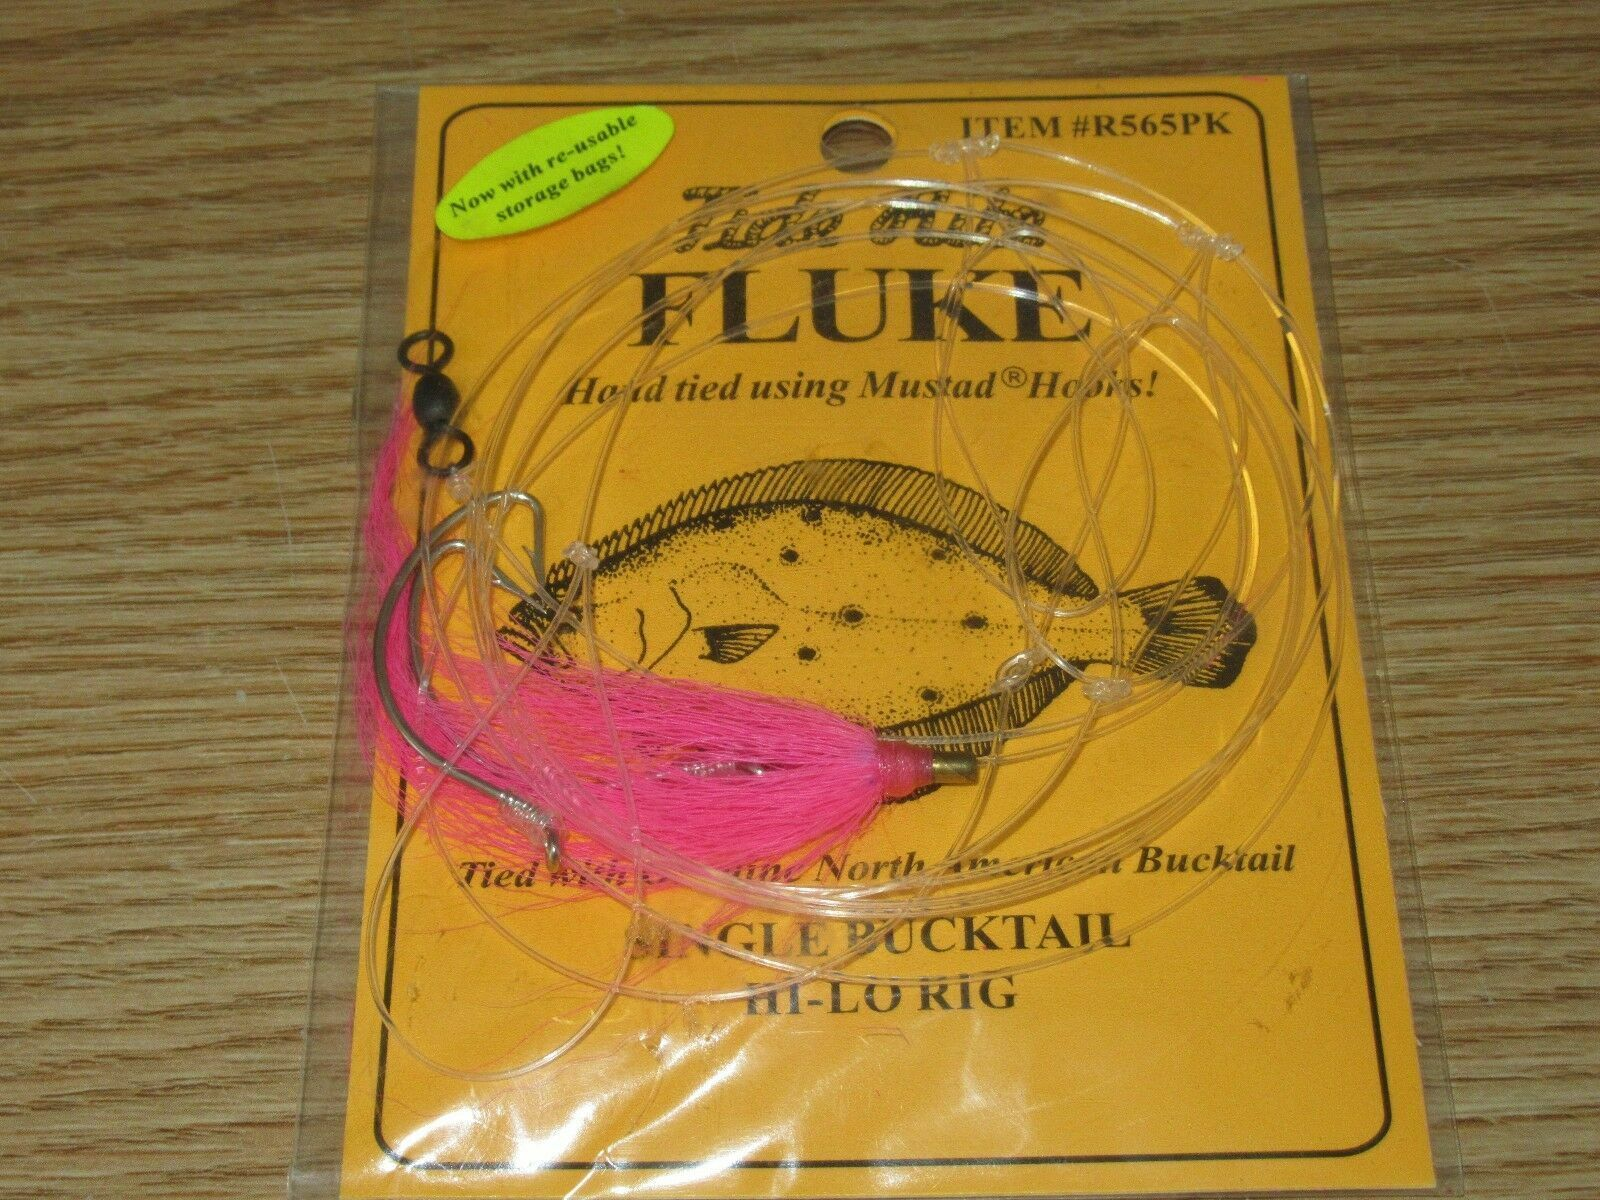 6 FLUKE RIGS FLATFISH TIDE RITE R565PK FLOUNDER SALTWATER RIG FISHING MUSTAD